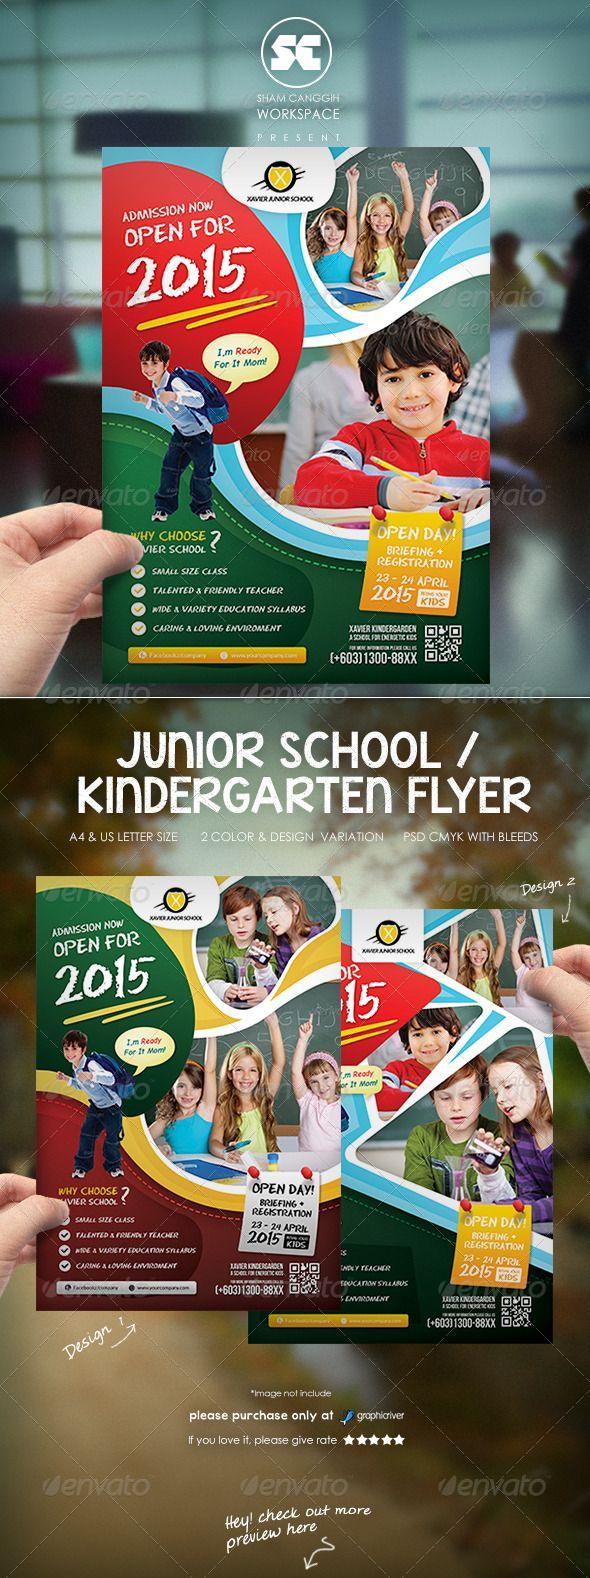 Kindergarten Junior School Flyer — Photoshop Psd #admission #promotion •  Available Here → Https://graphicriver.net/item/kind… | Business Flyer  Template